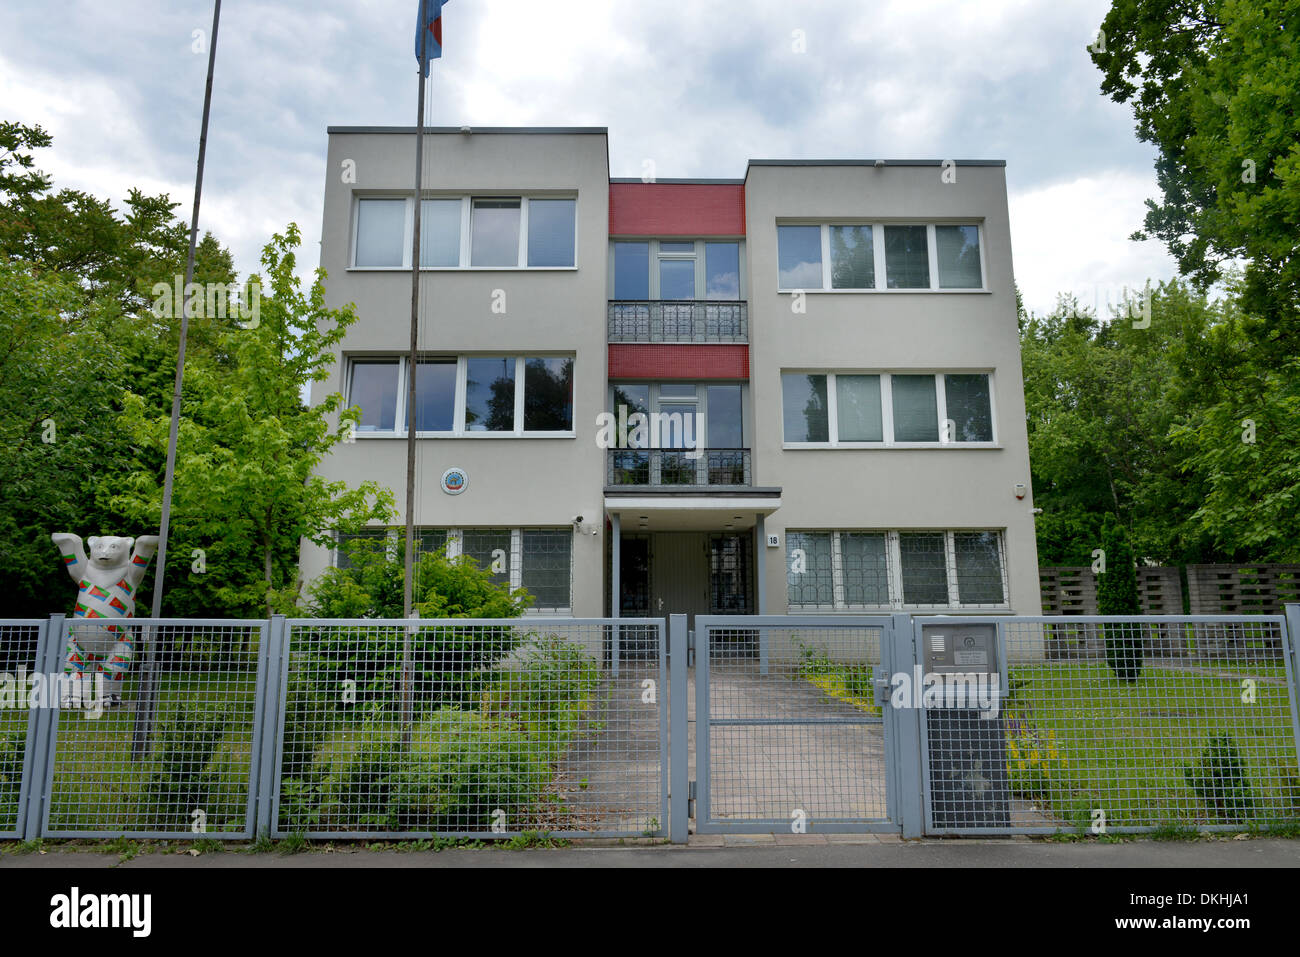 Botschaft Eritrea, Stavangerstrasse, Pankow, Berlin, Deutschland Stock Photo